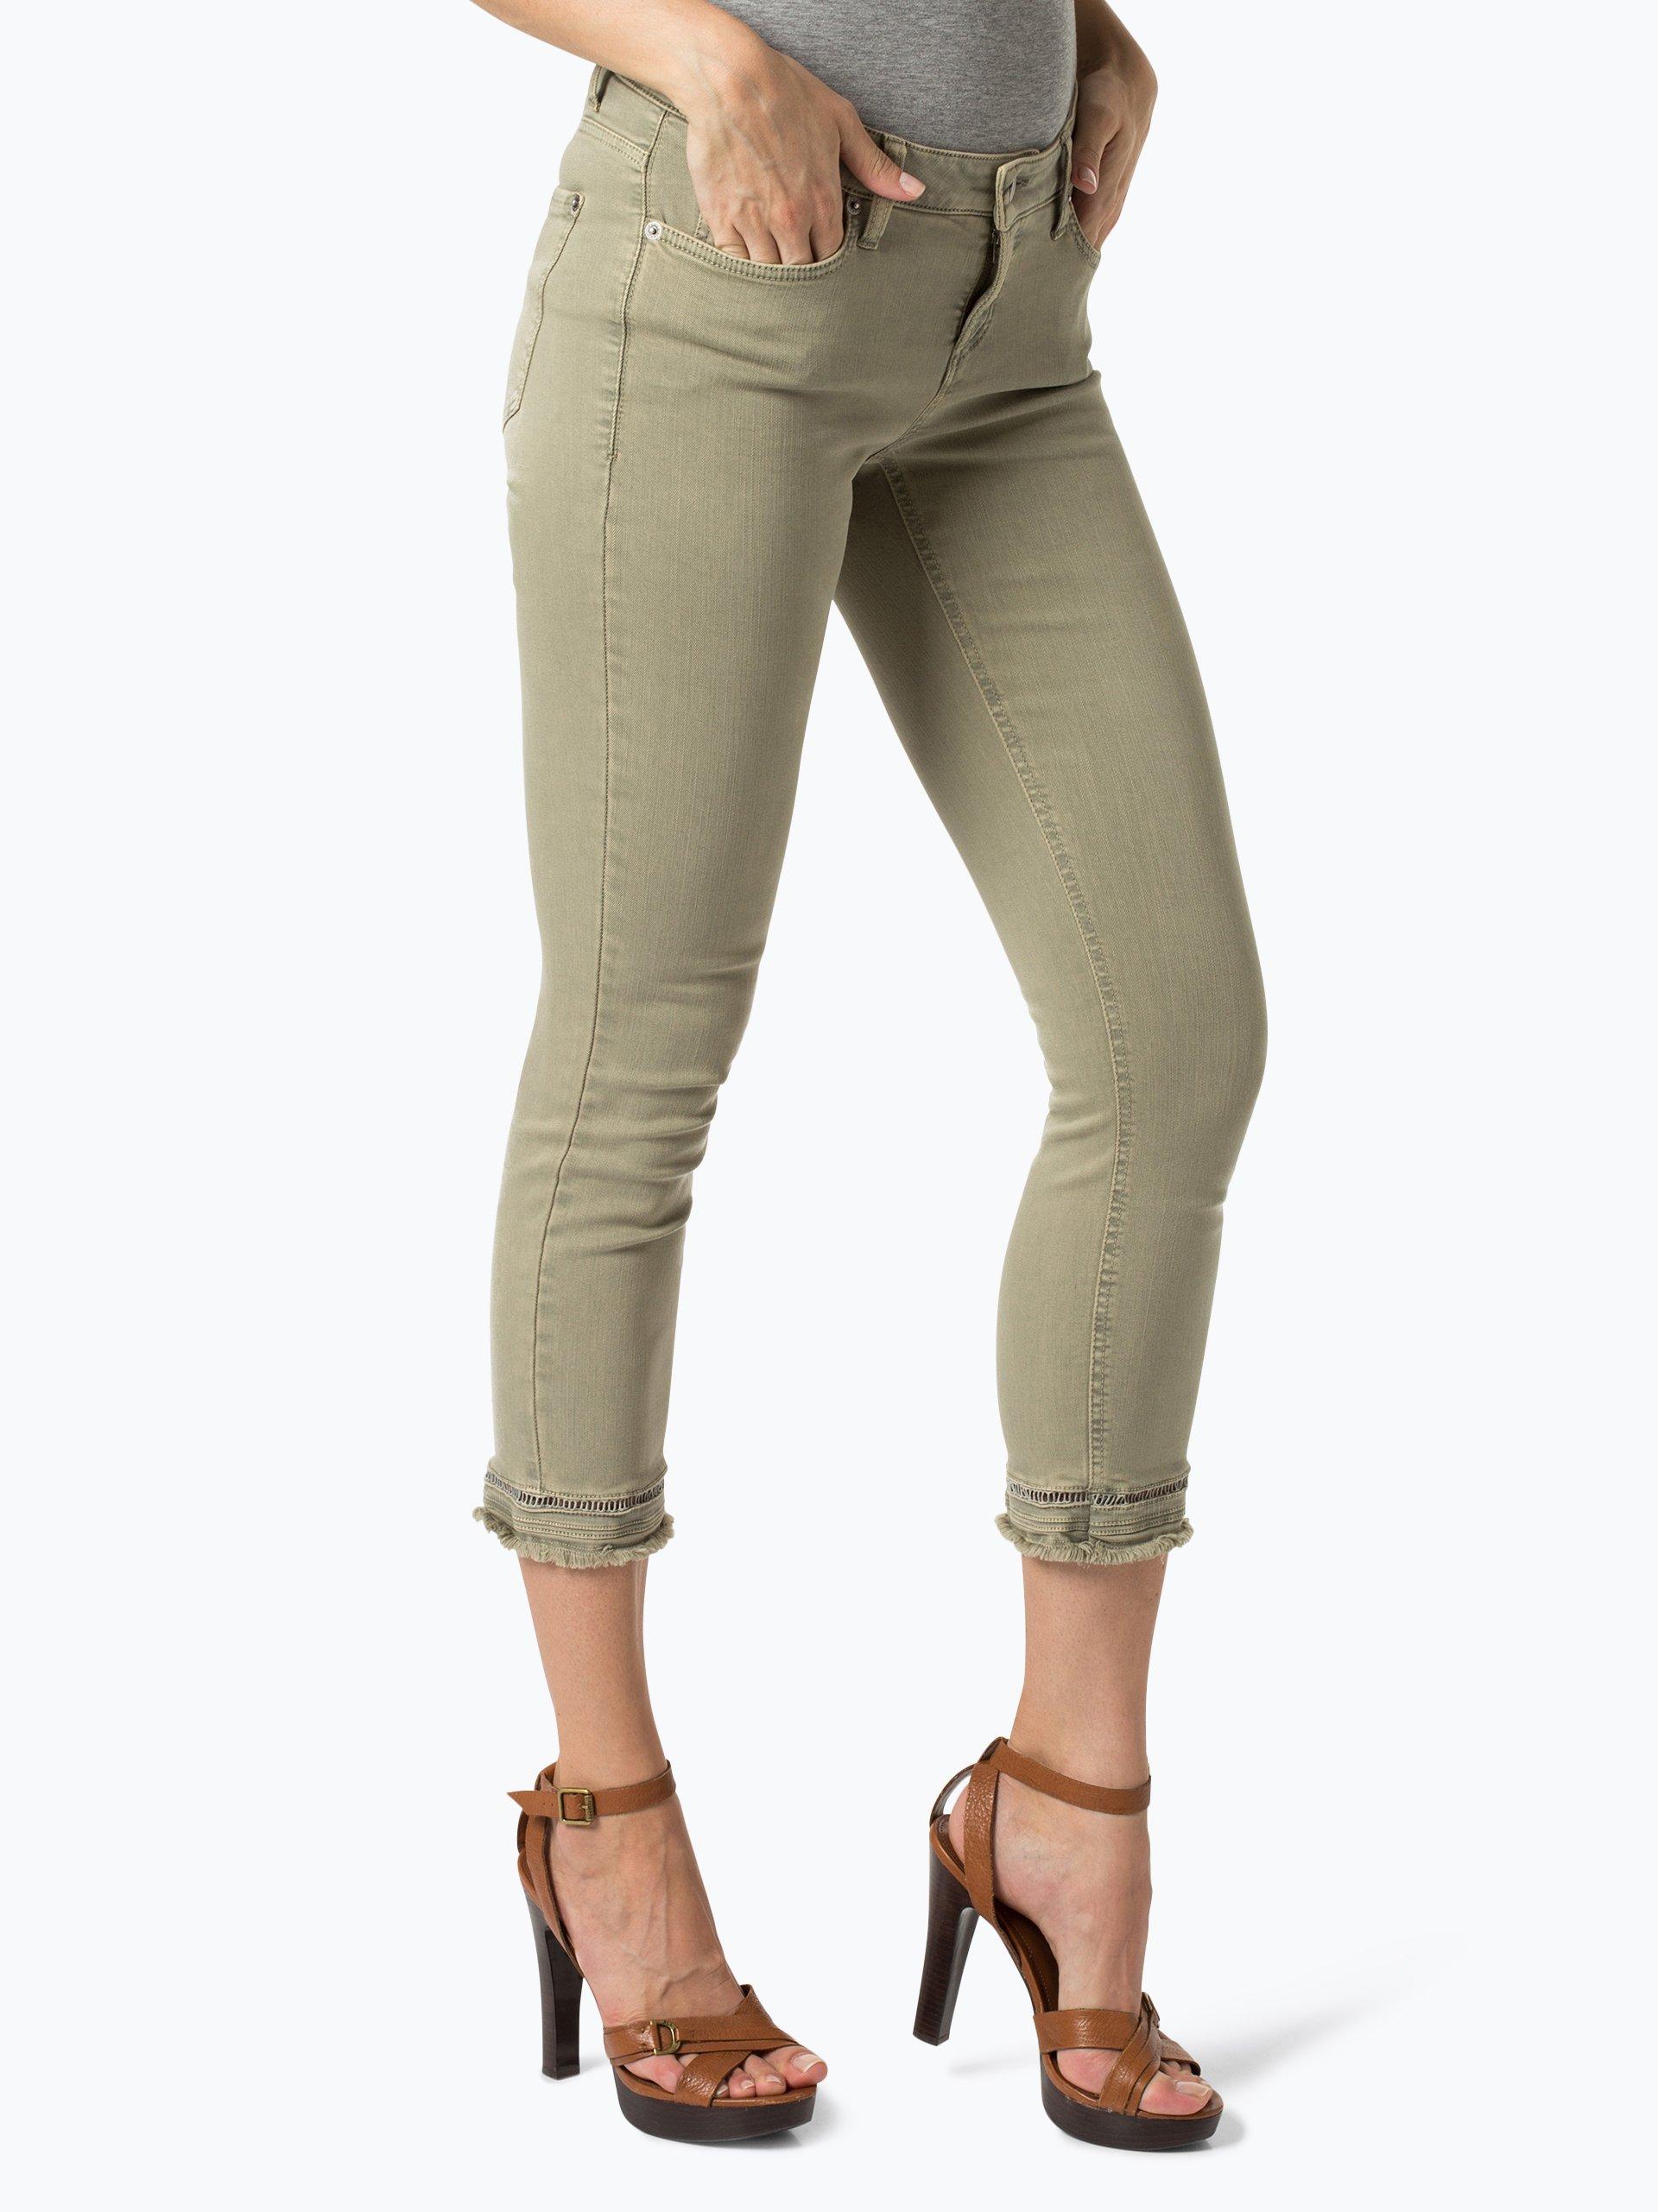 cambio damen jeans liu khaki uni online kaufen peek und cloppenburg de. Black Bedroom Furniture Sets. Home Design Ideas